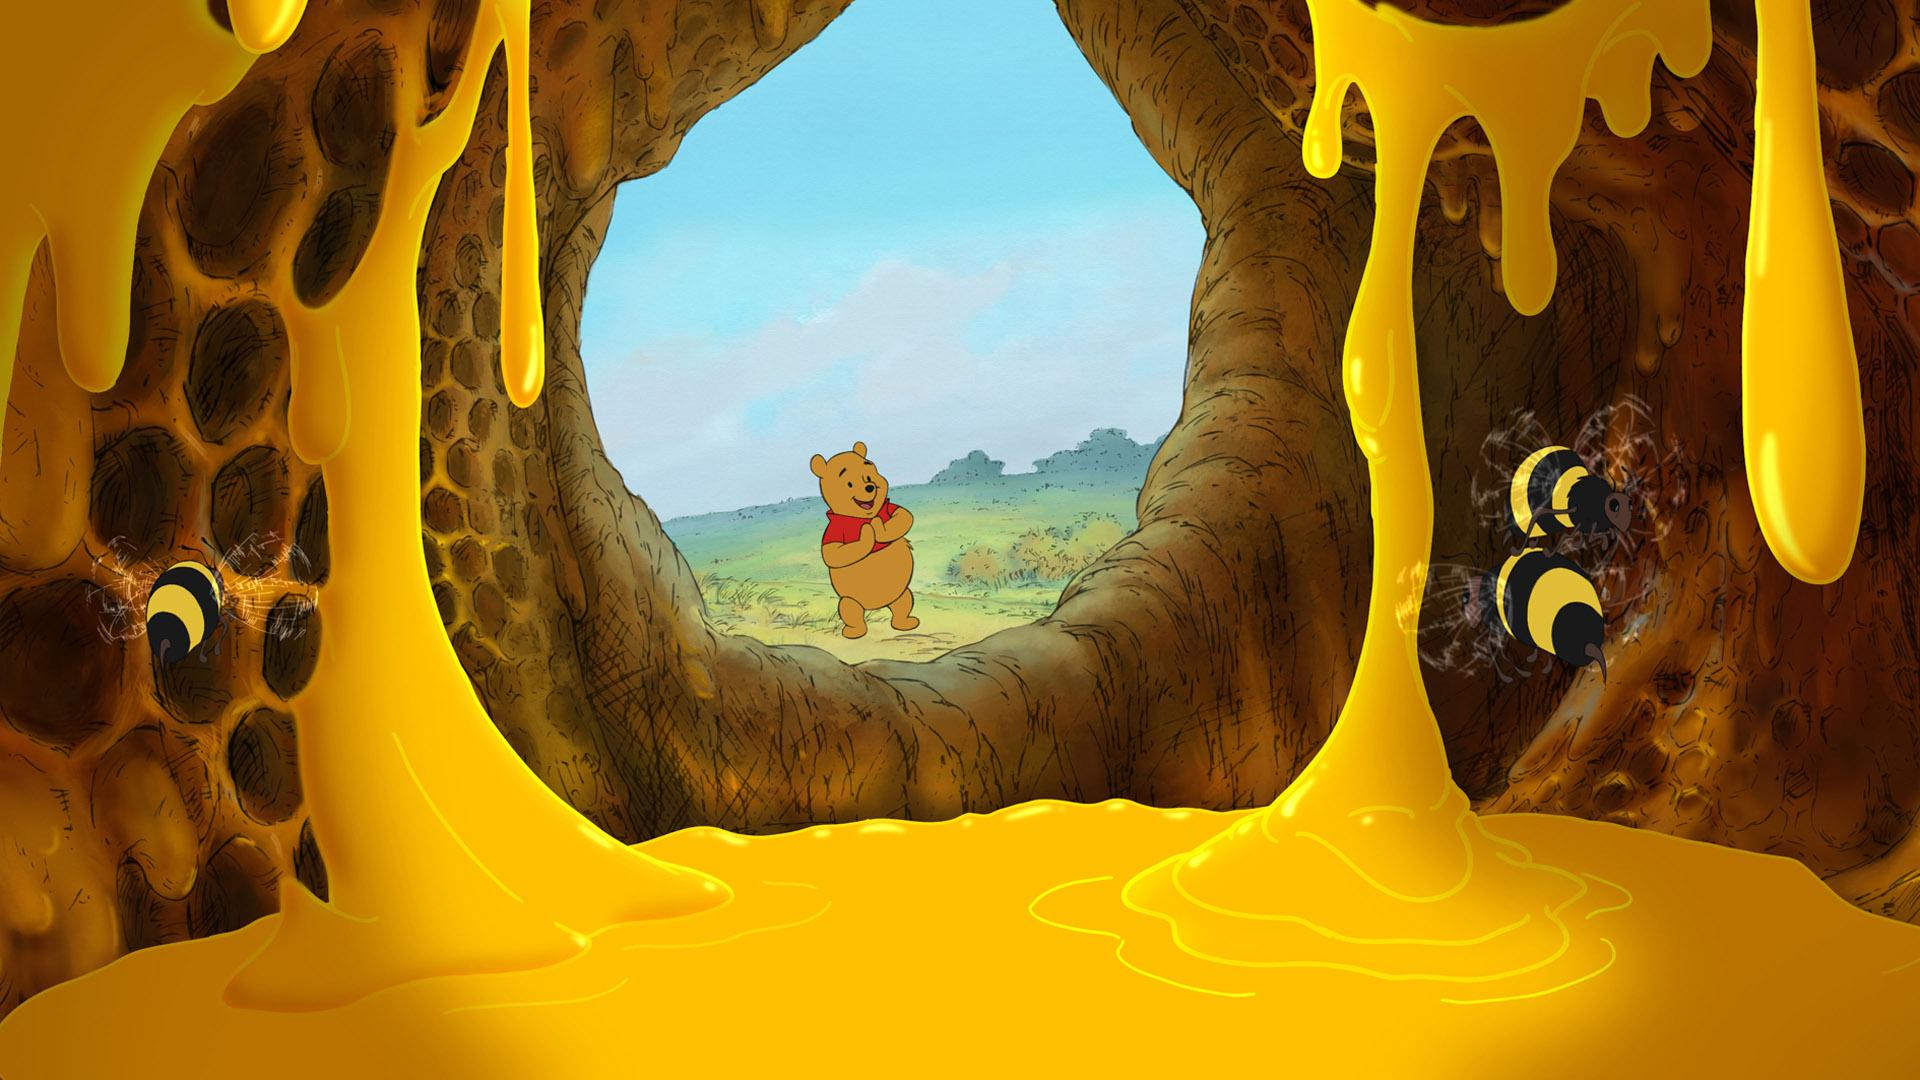 Winnie Pooh Wallpaper Winnie The Pooh Fotos